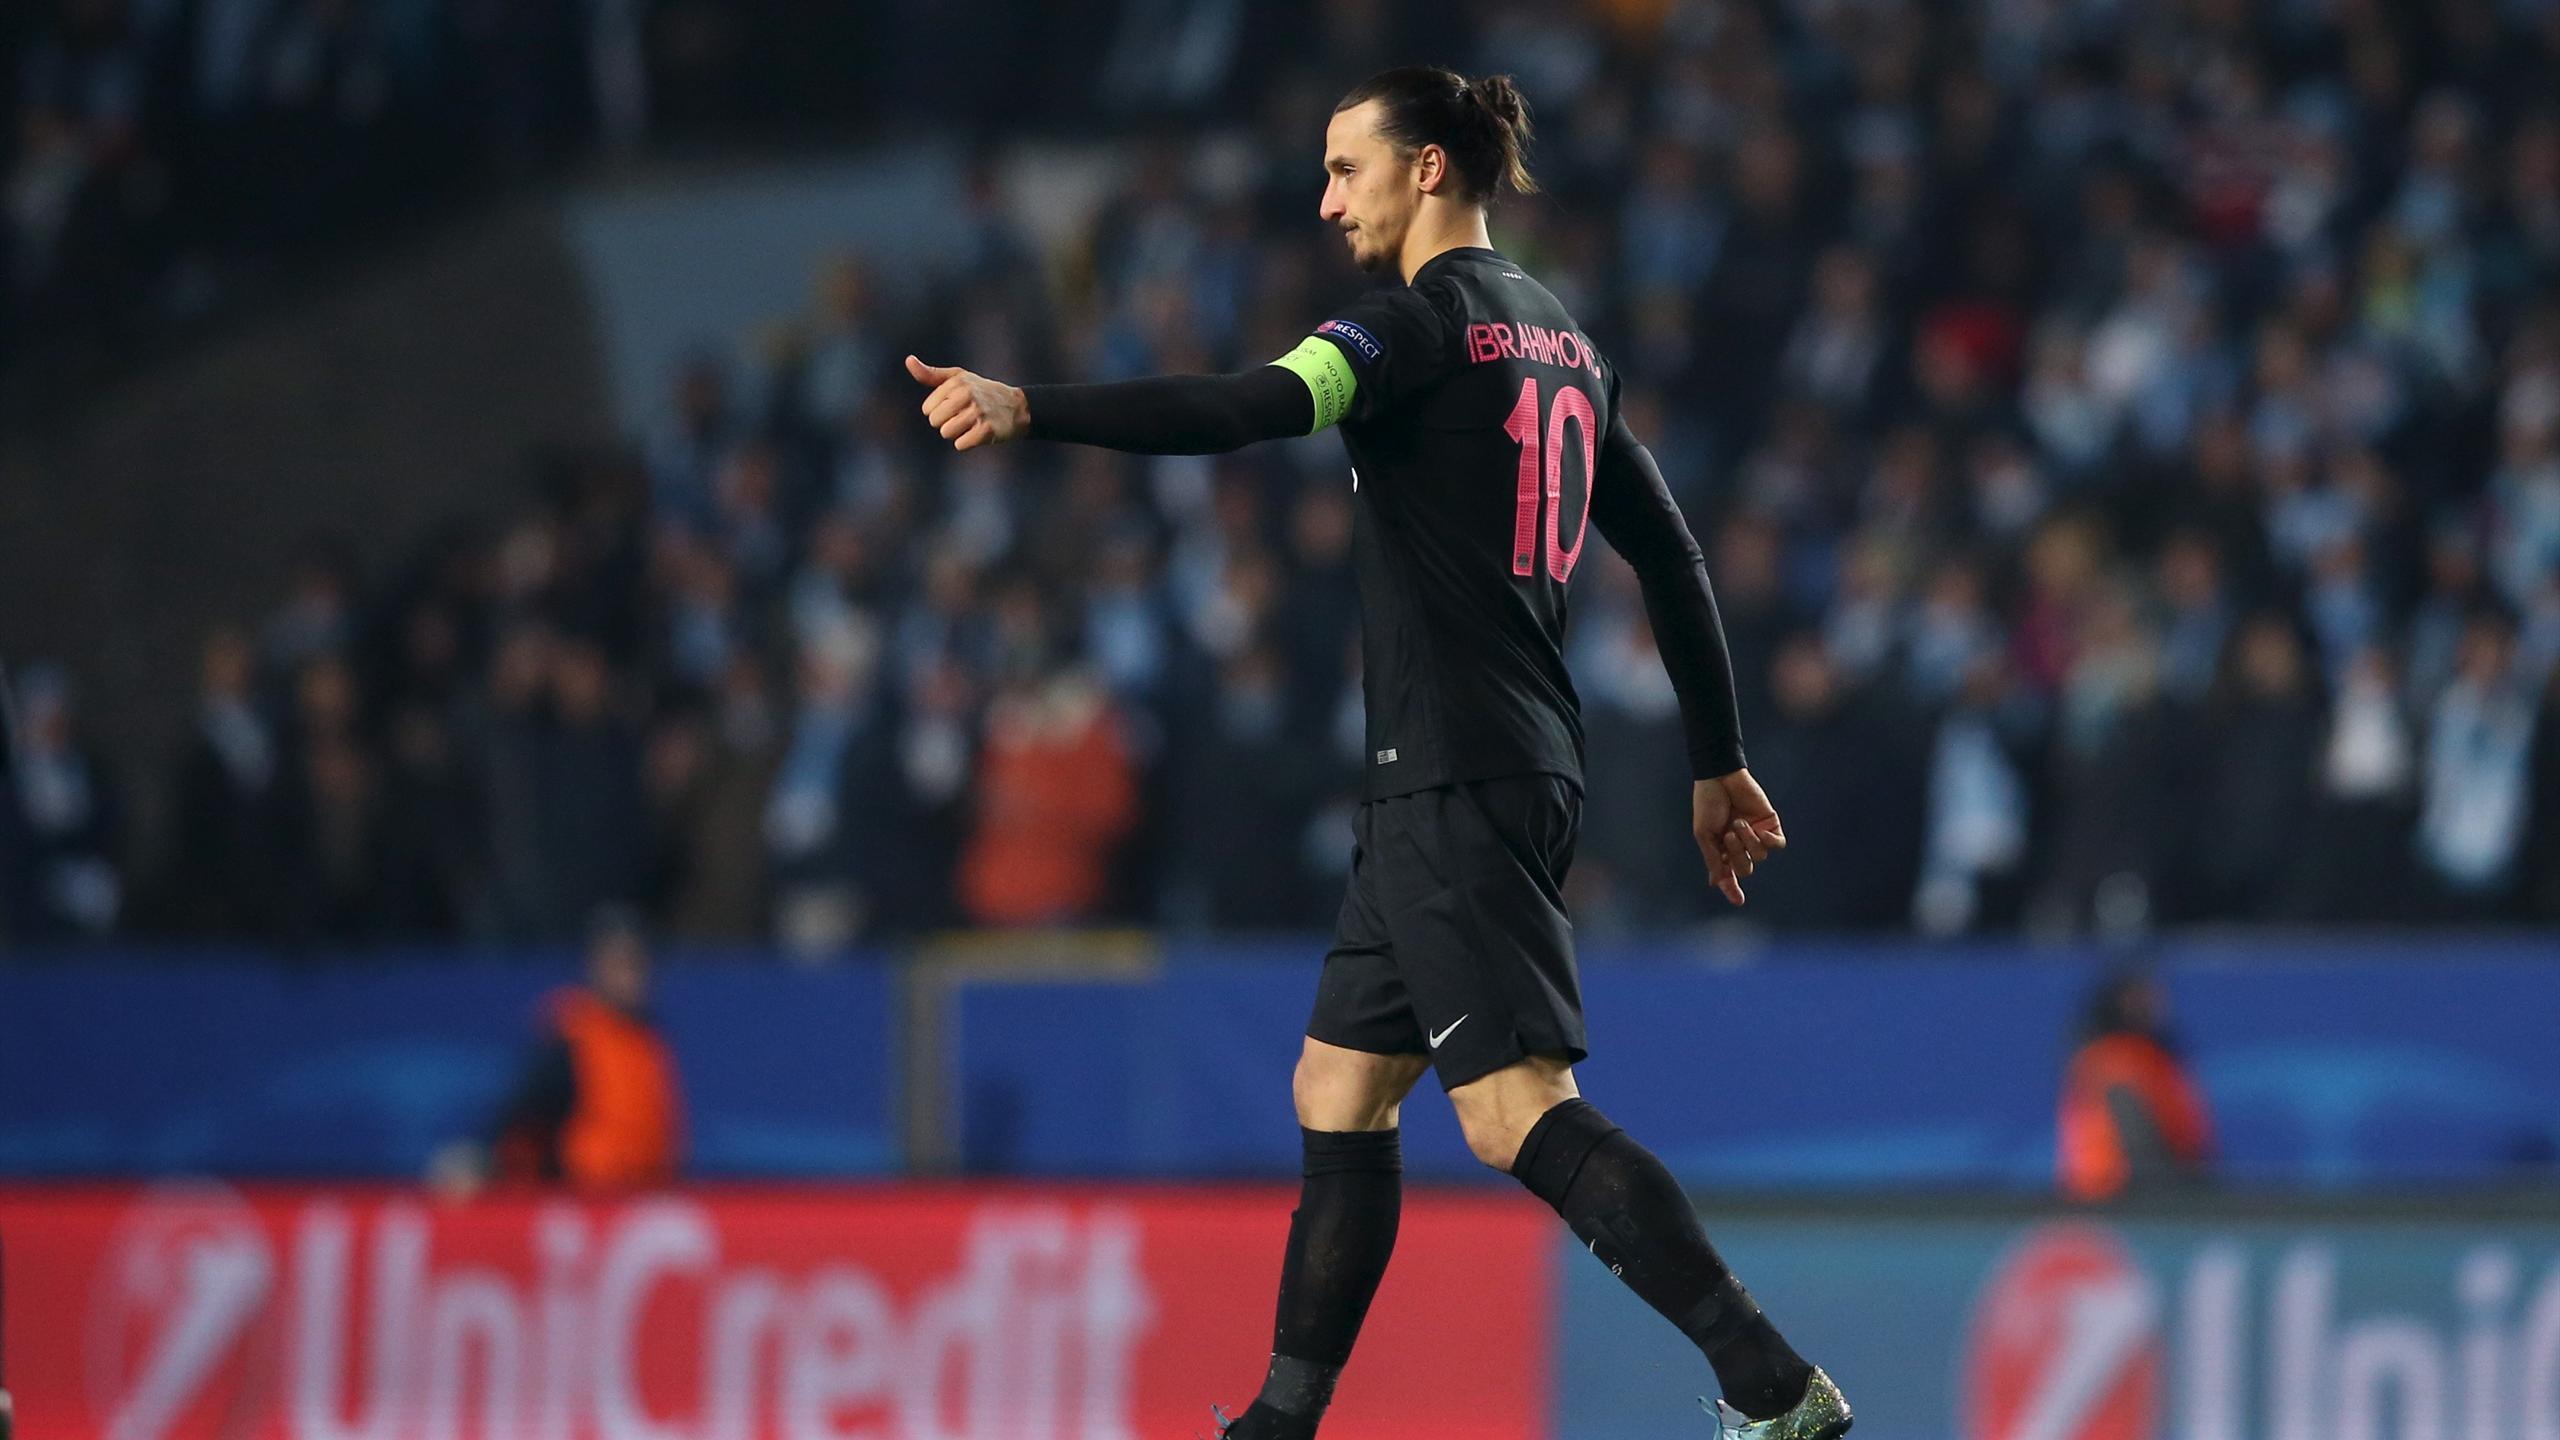 With Star Psg Zlatan Home Qualify Nets Five Ibrahimovic As Return On nHHv80